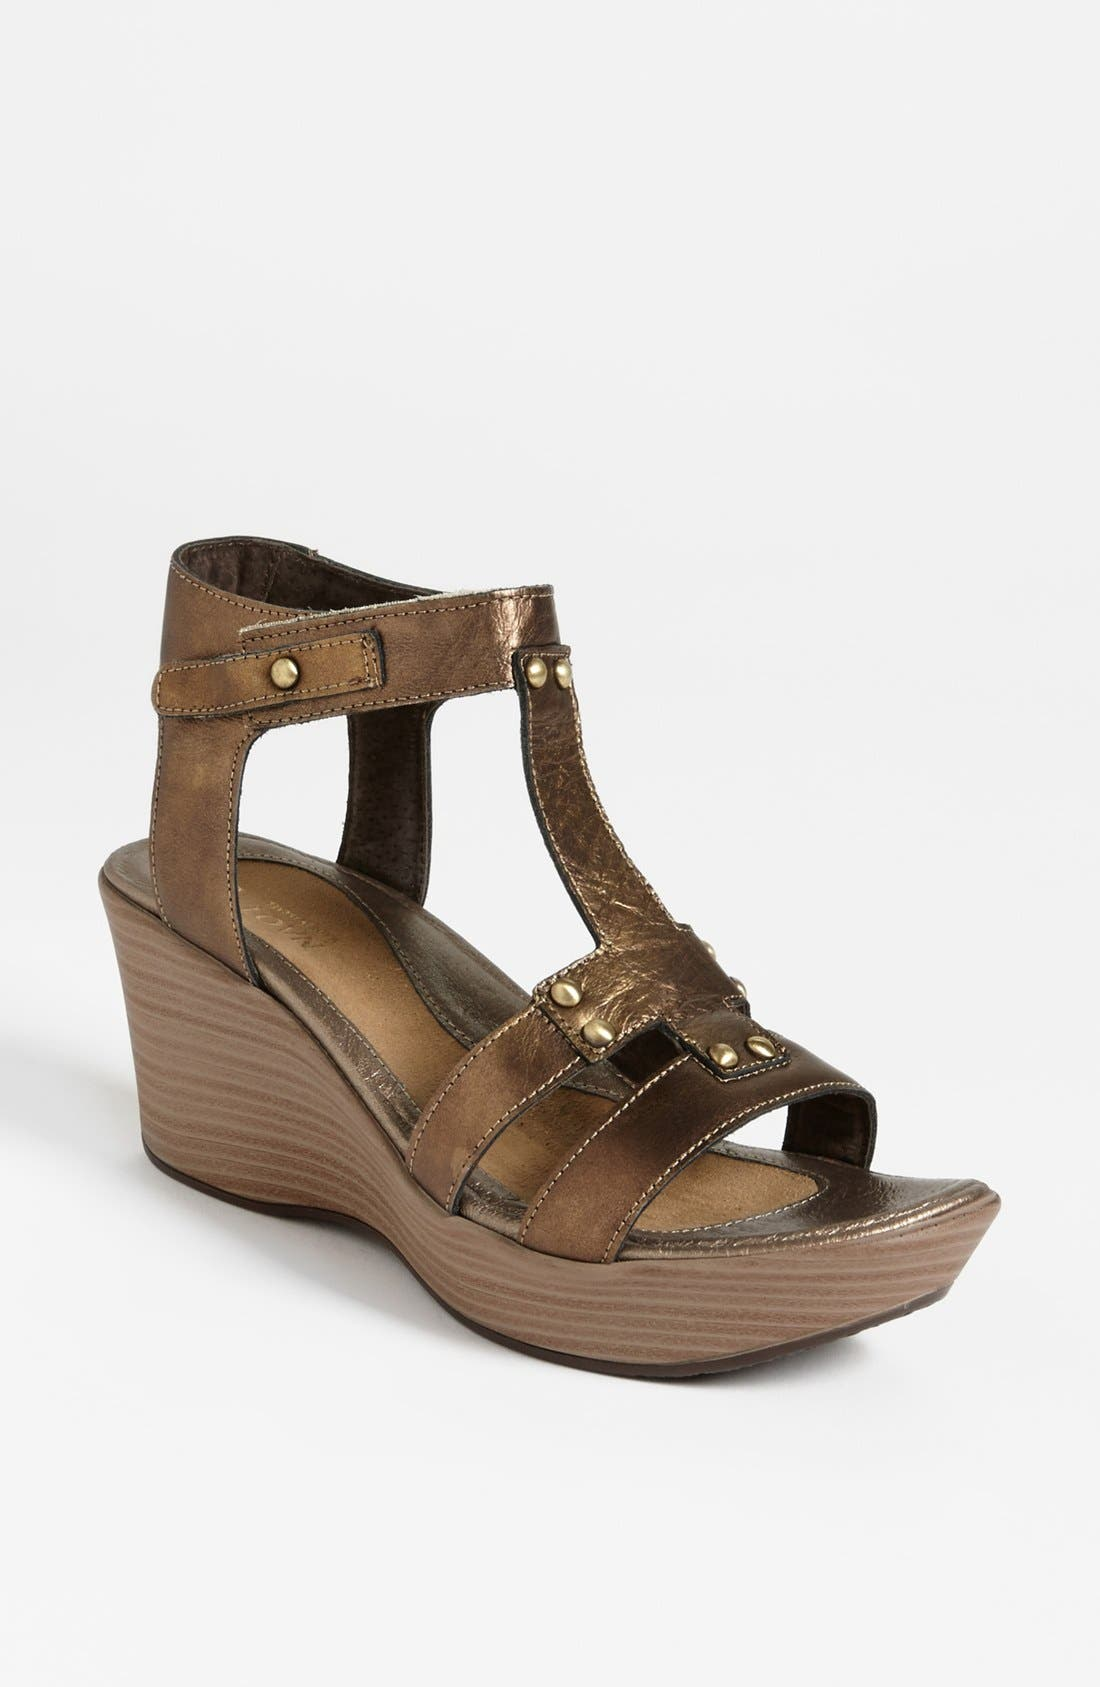 Naot 'Flirt' Sandal